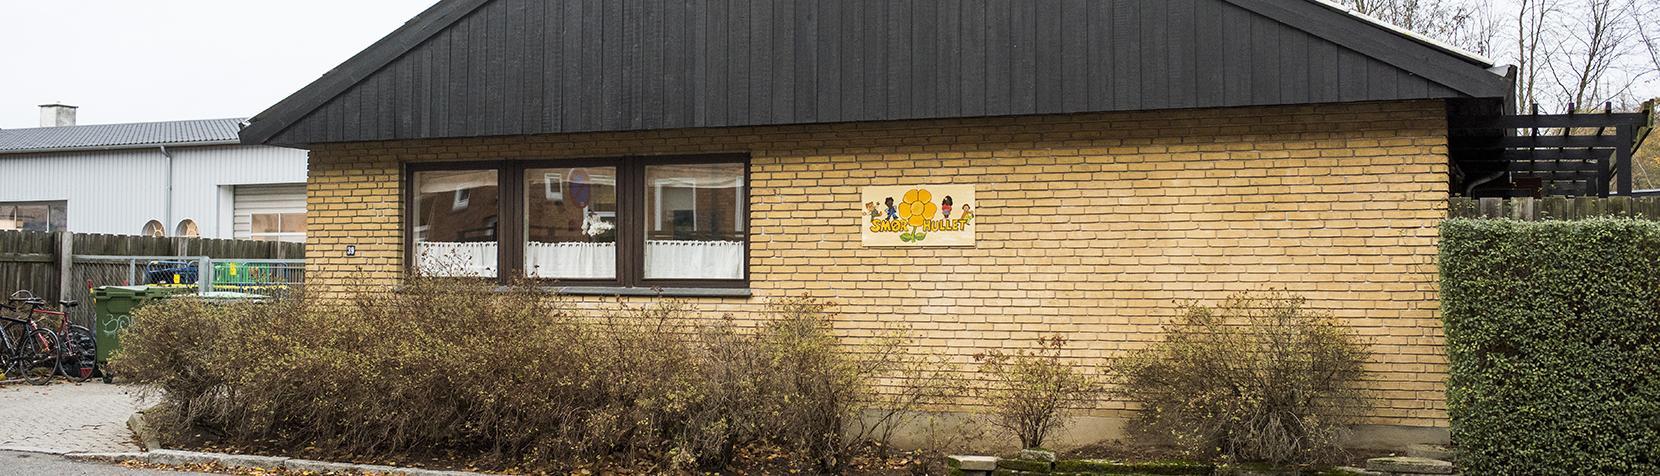 Børnehuset Smørhullet